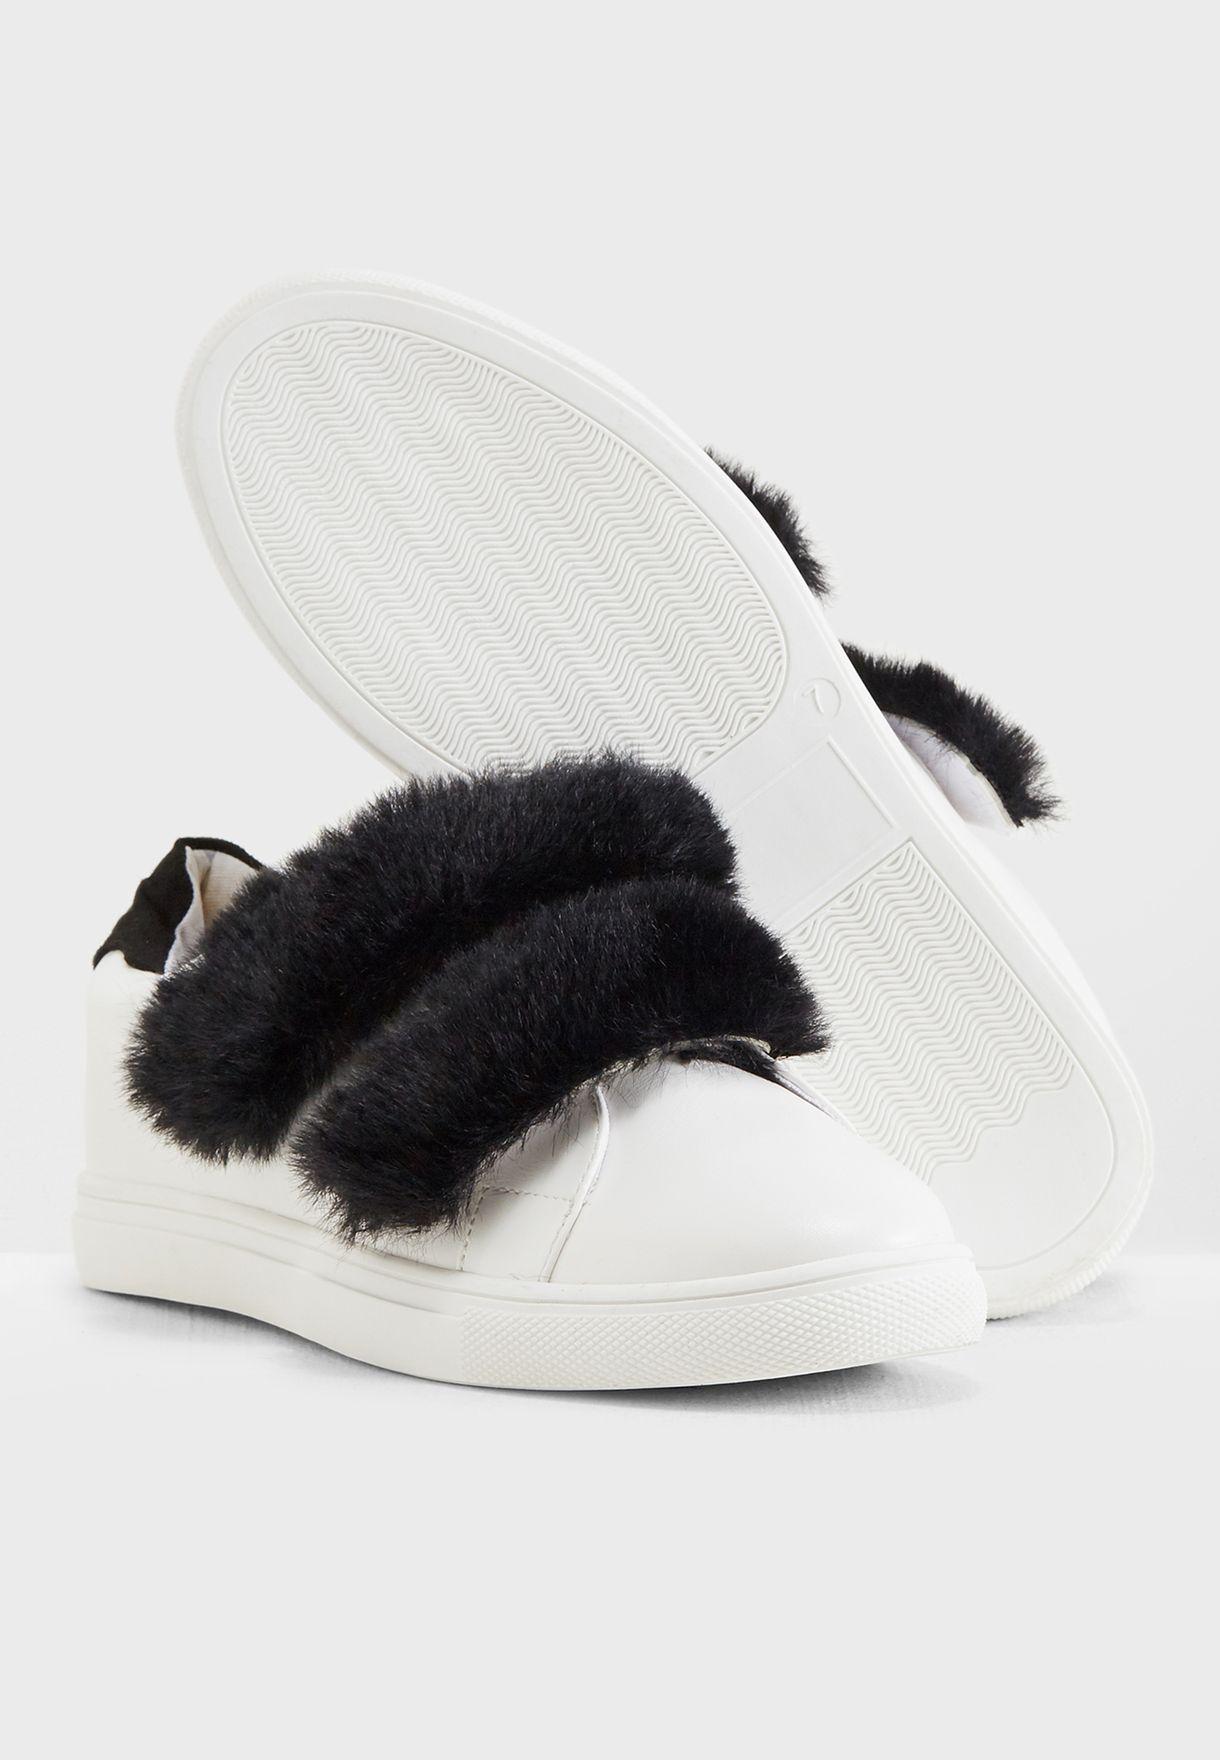 حذاء فلات مزين بالفرو